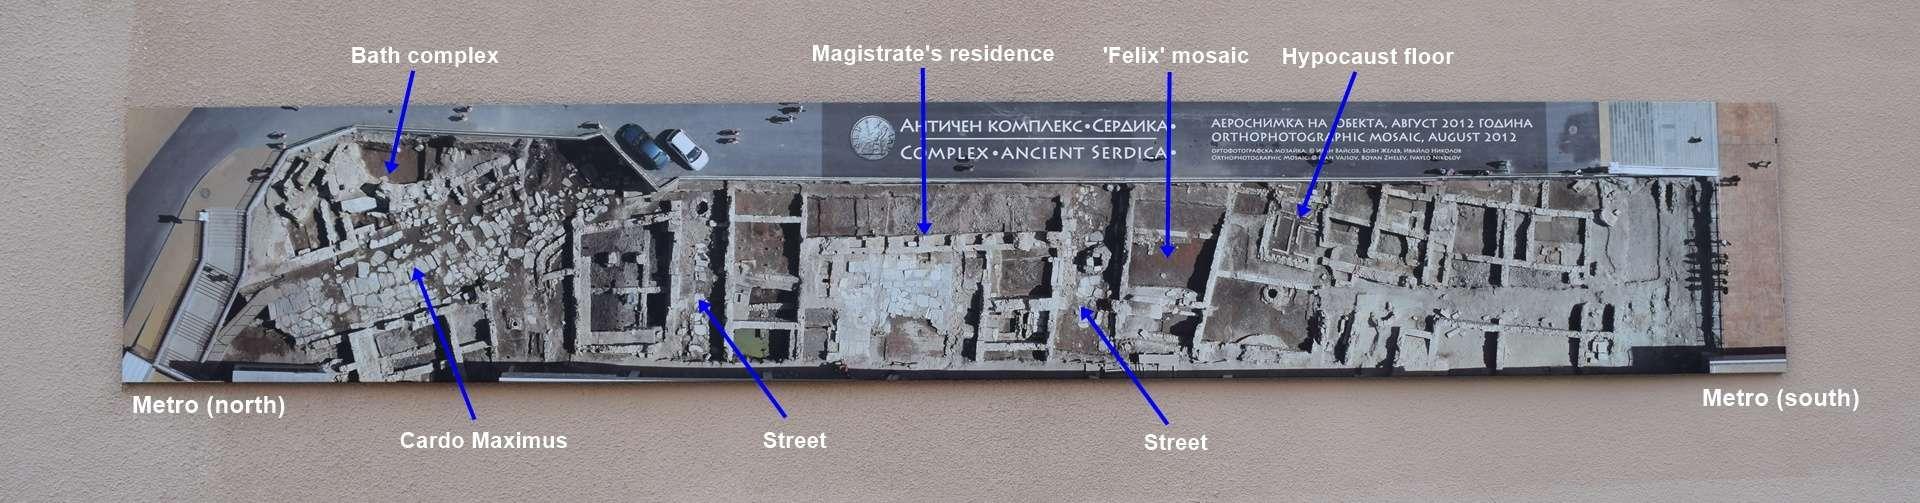 Archaeology Travel   Serdika II Metro Station: Gateway to Sofia's Roman Past   11